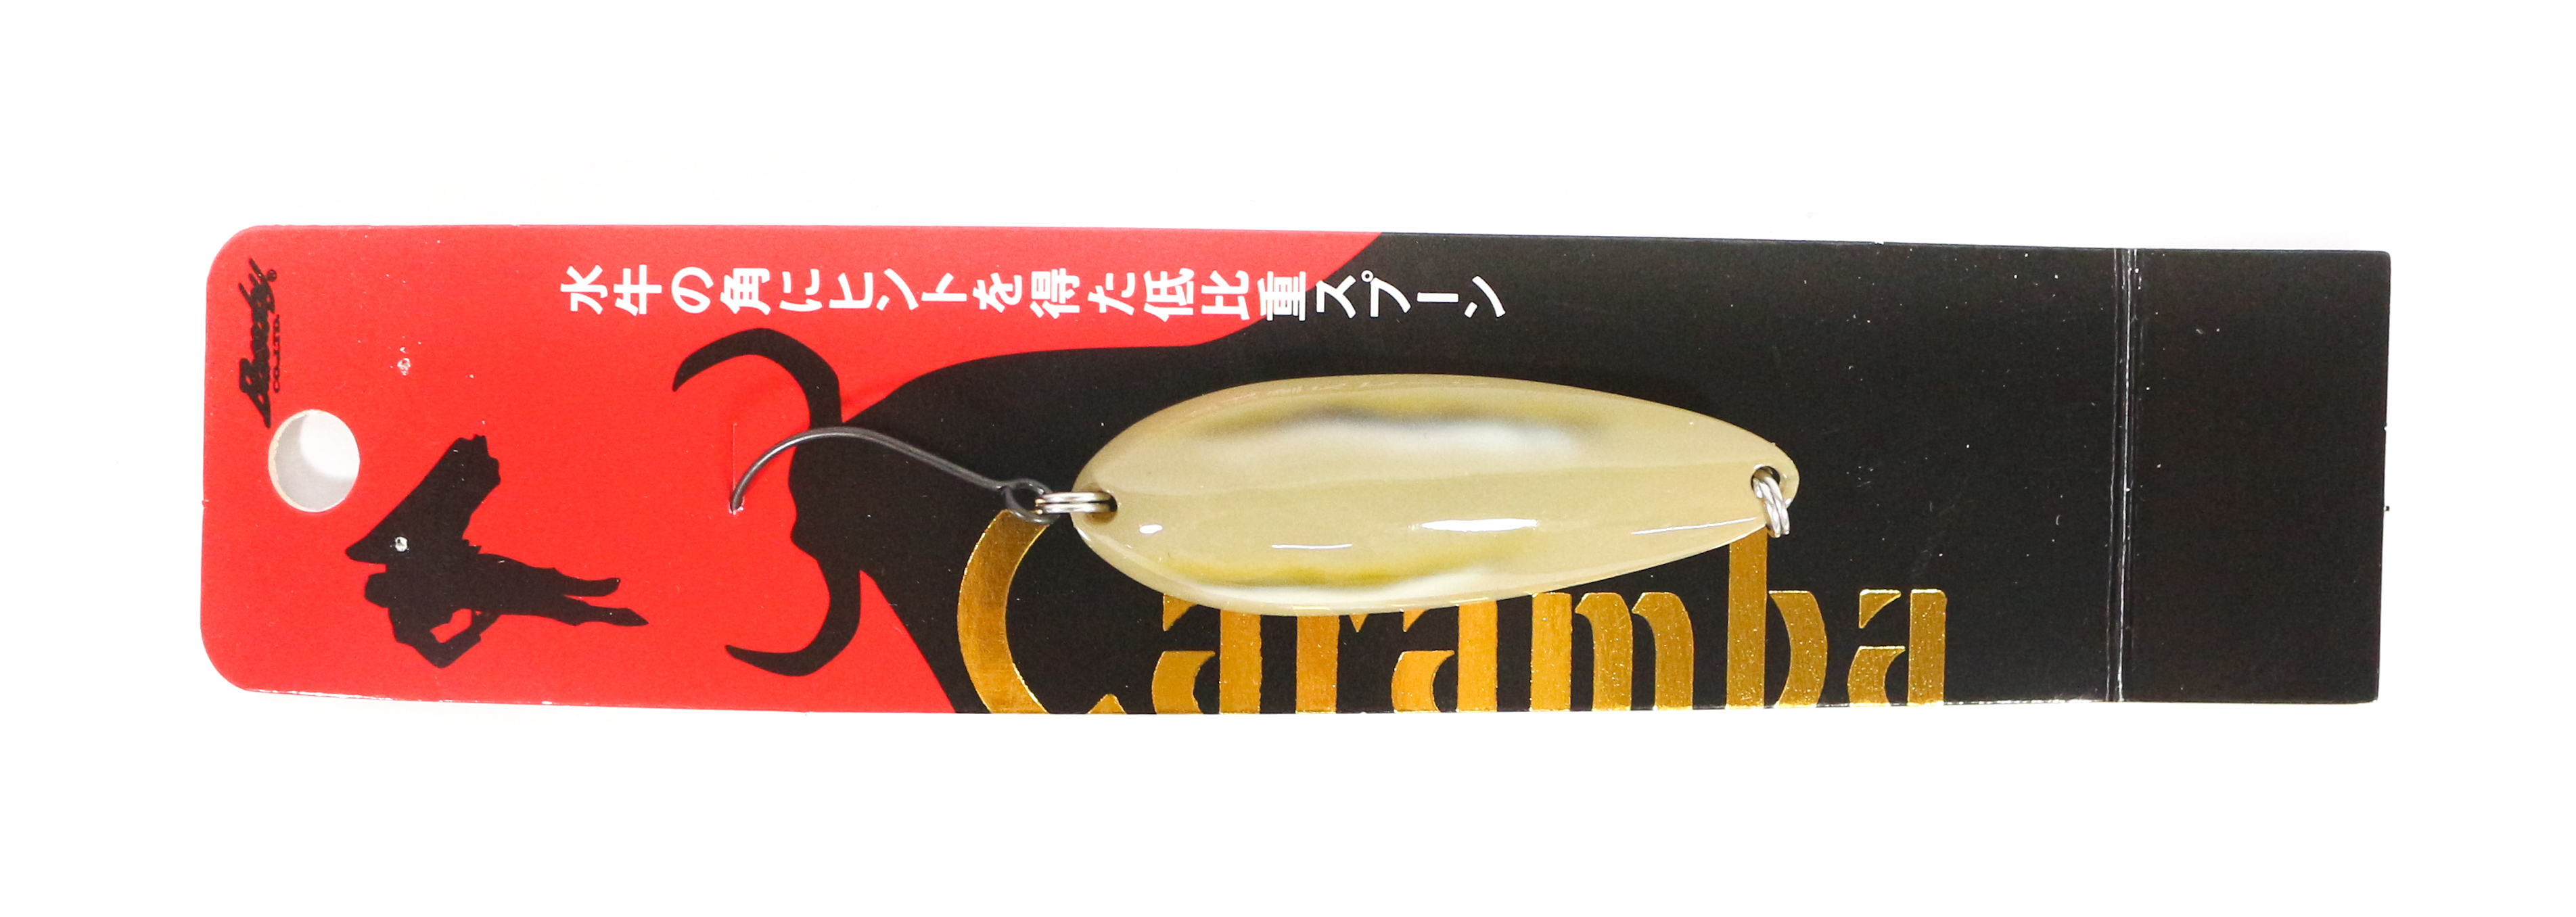 Sale Bassday Caramba 50 Spoon 3 grams 103 (3032)